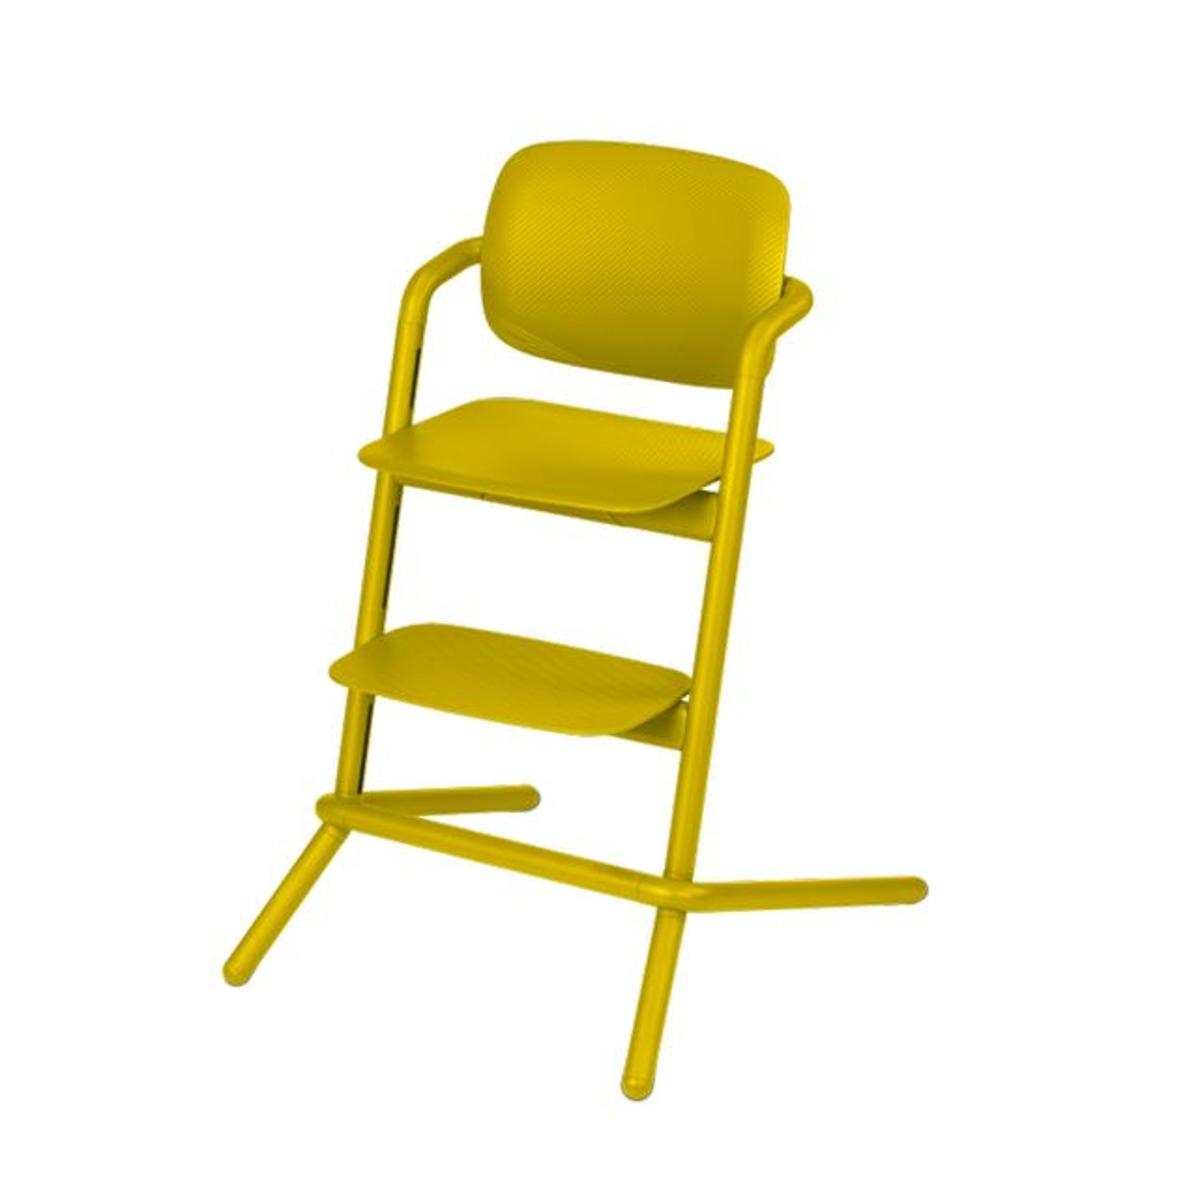 Chaise haute Lemo canary yellow